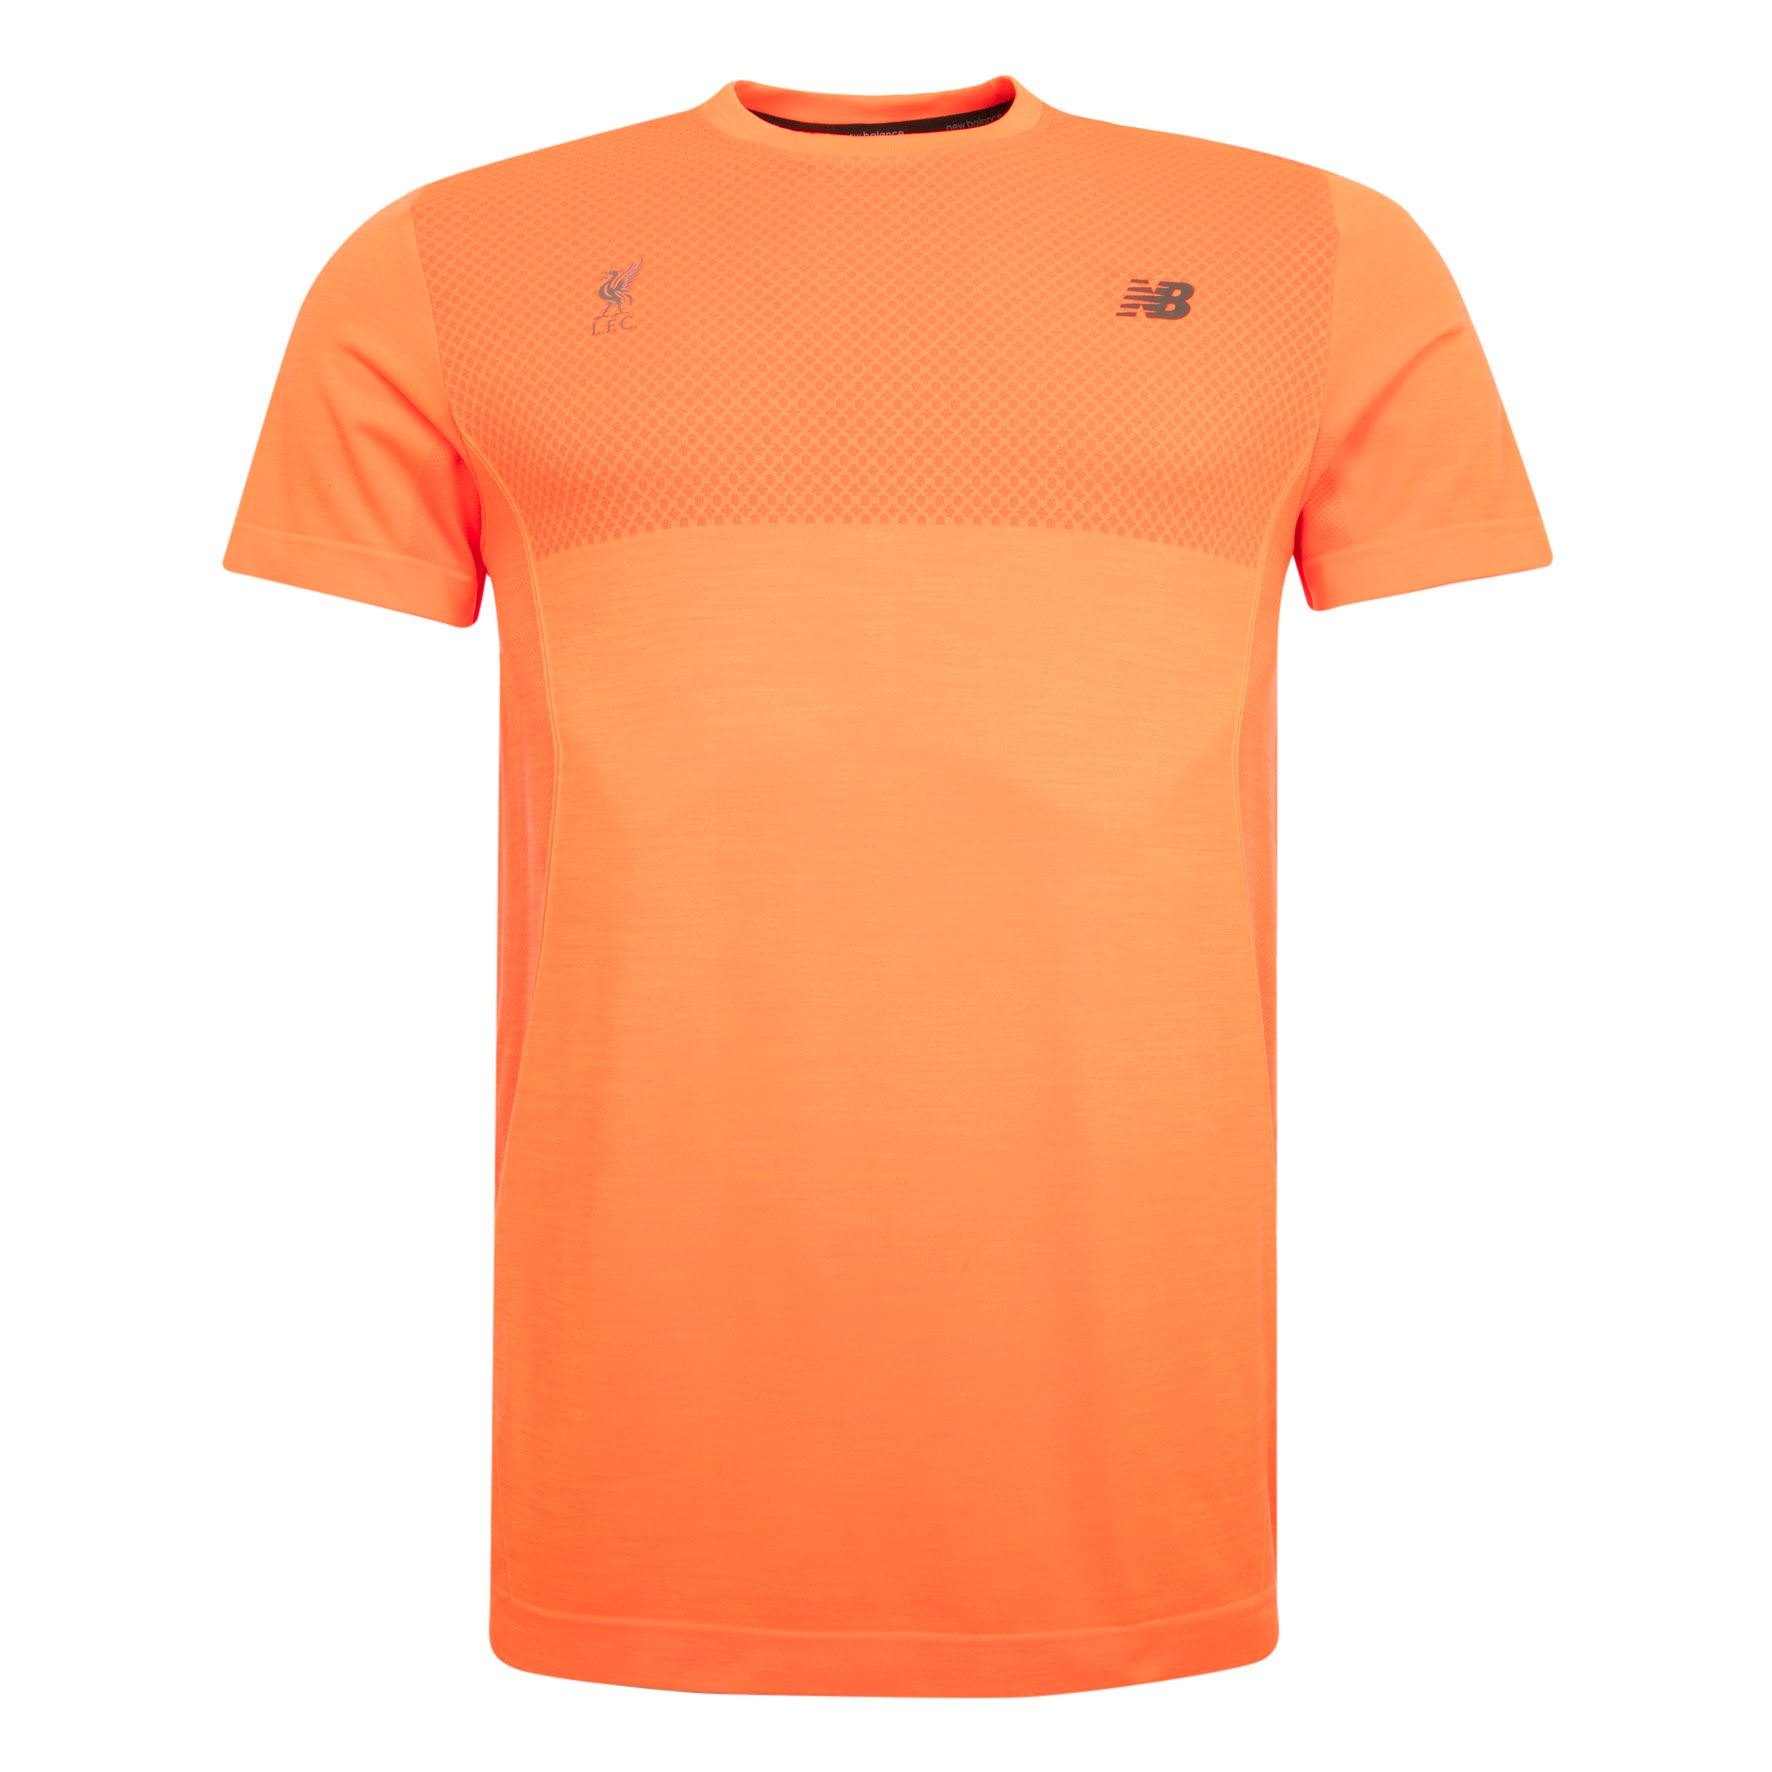 New Balance Mens Orange Seamless Short Sleeve T Shirt Liverpool FC ...